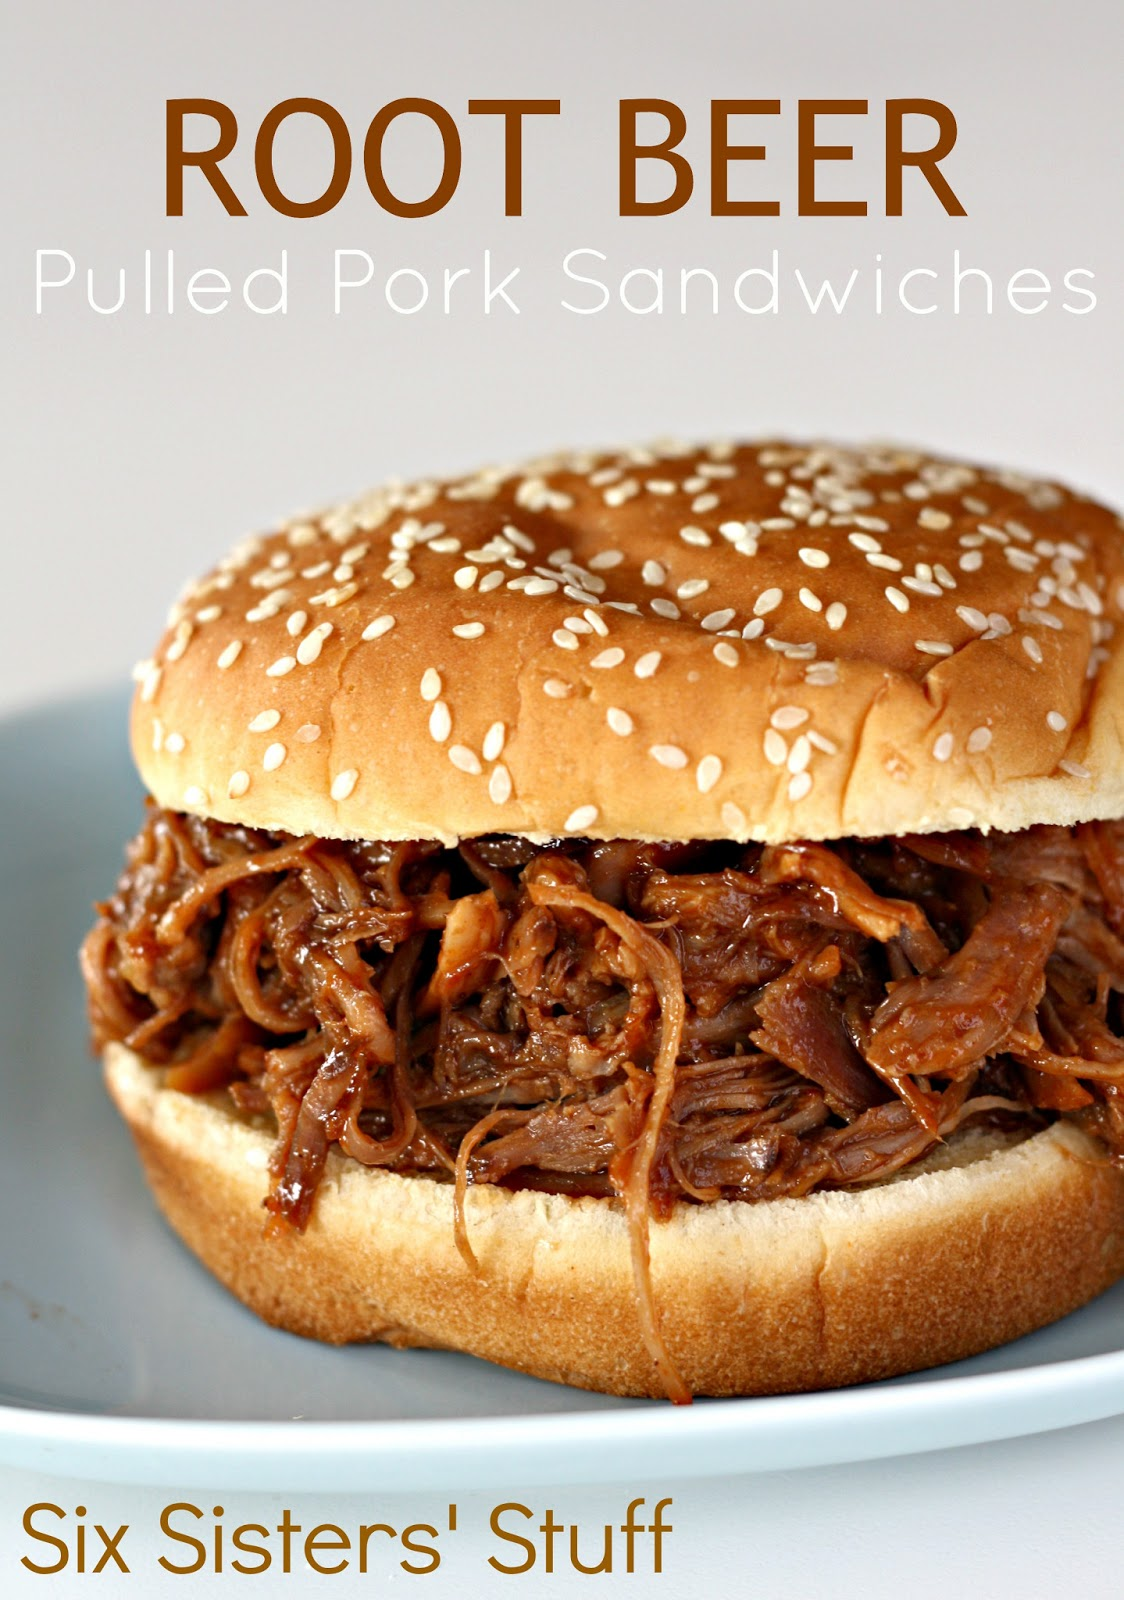 Pulled pork sandwich slow cooker recipe